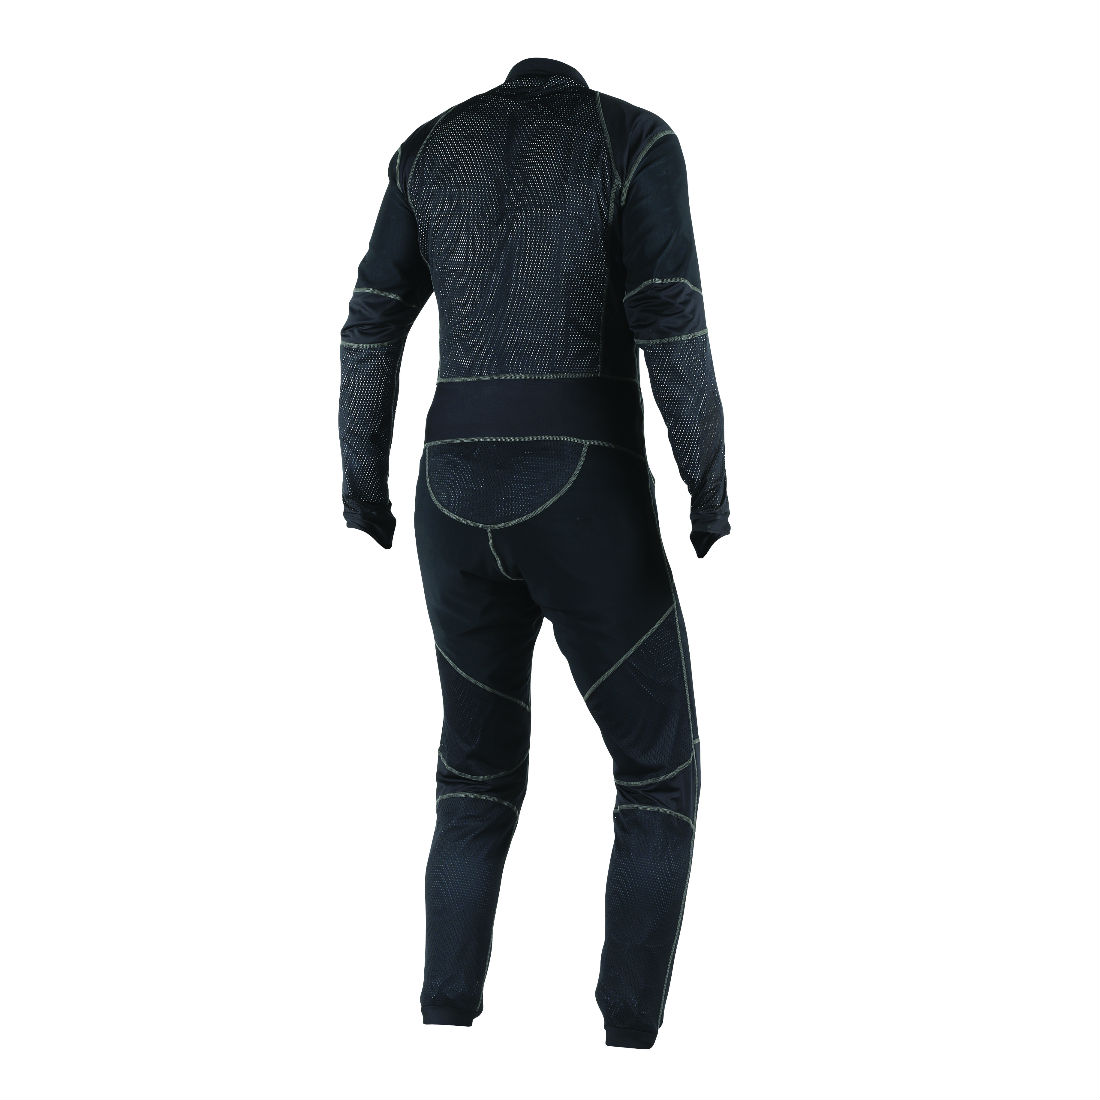 【DAINESE】D-CORE    AERO 連身內穿套裝 - 「Webike-摩托百貨」